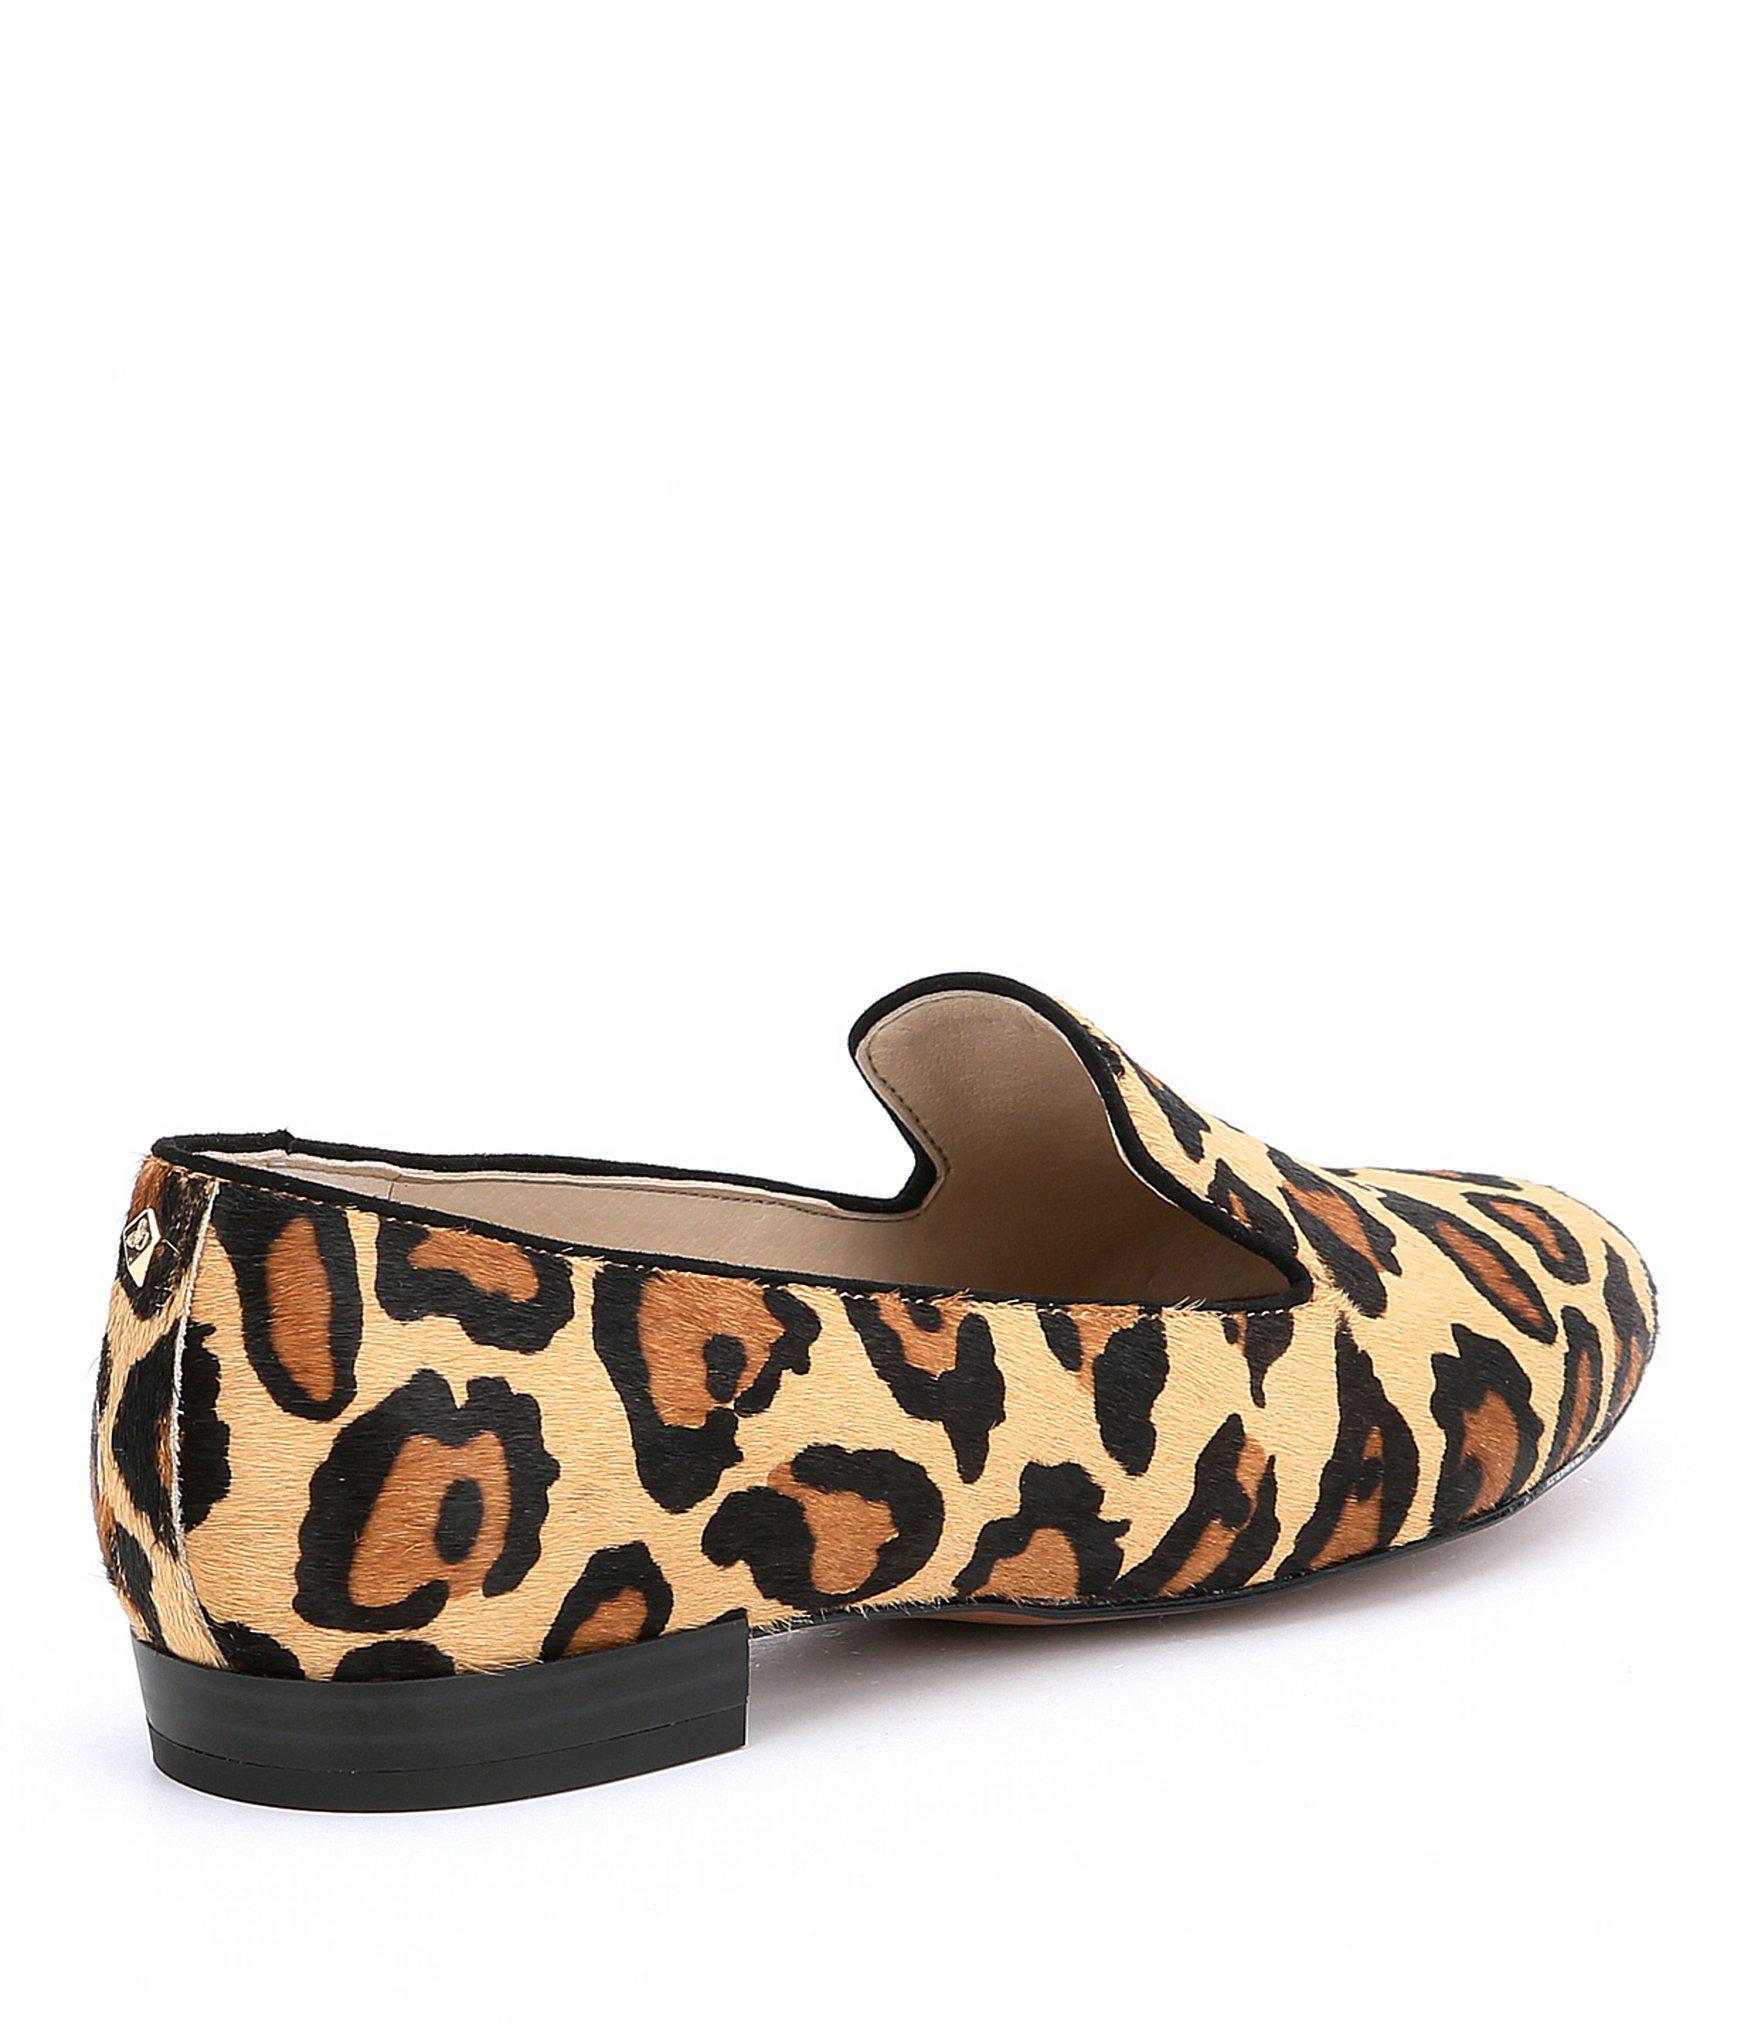 0df42f55a0ff16 Lyst - Sam Edelman Jordy Leopard Brahma Hair Loafers in Brown